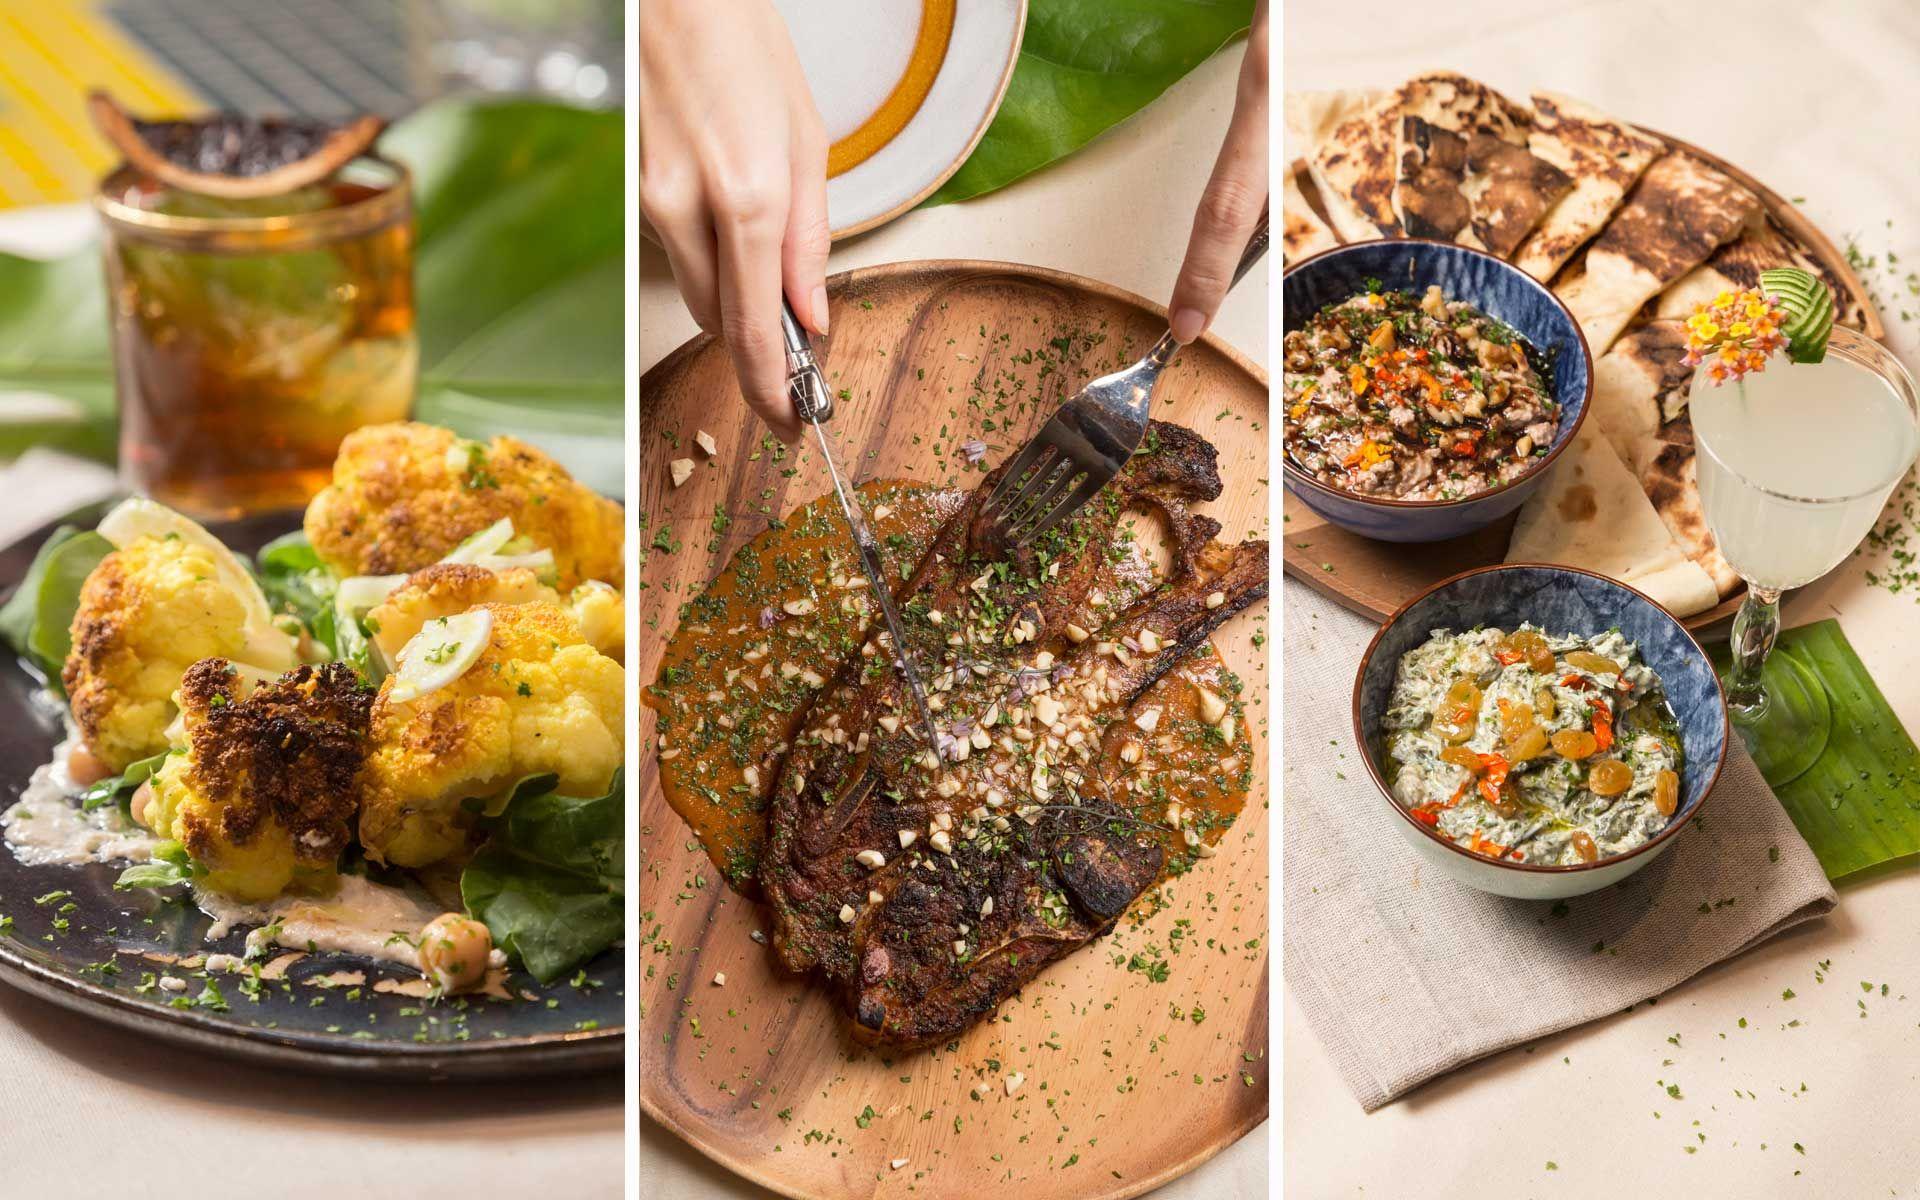 Dishes at Joloko. Photo: Khairul Imran / Malaysia Tatler